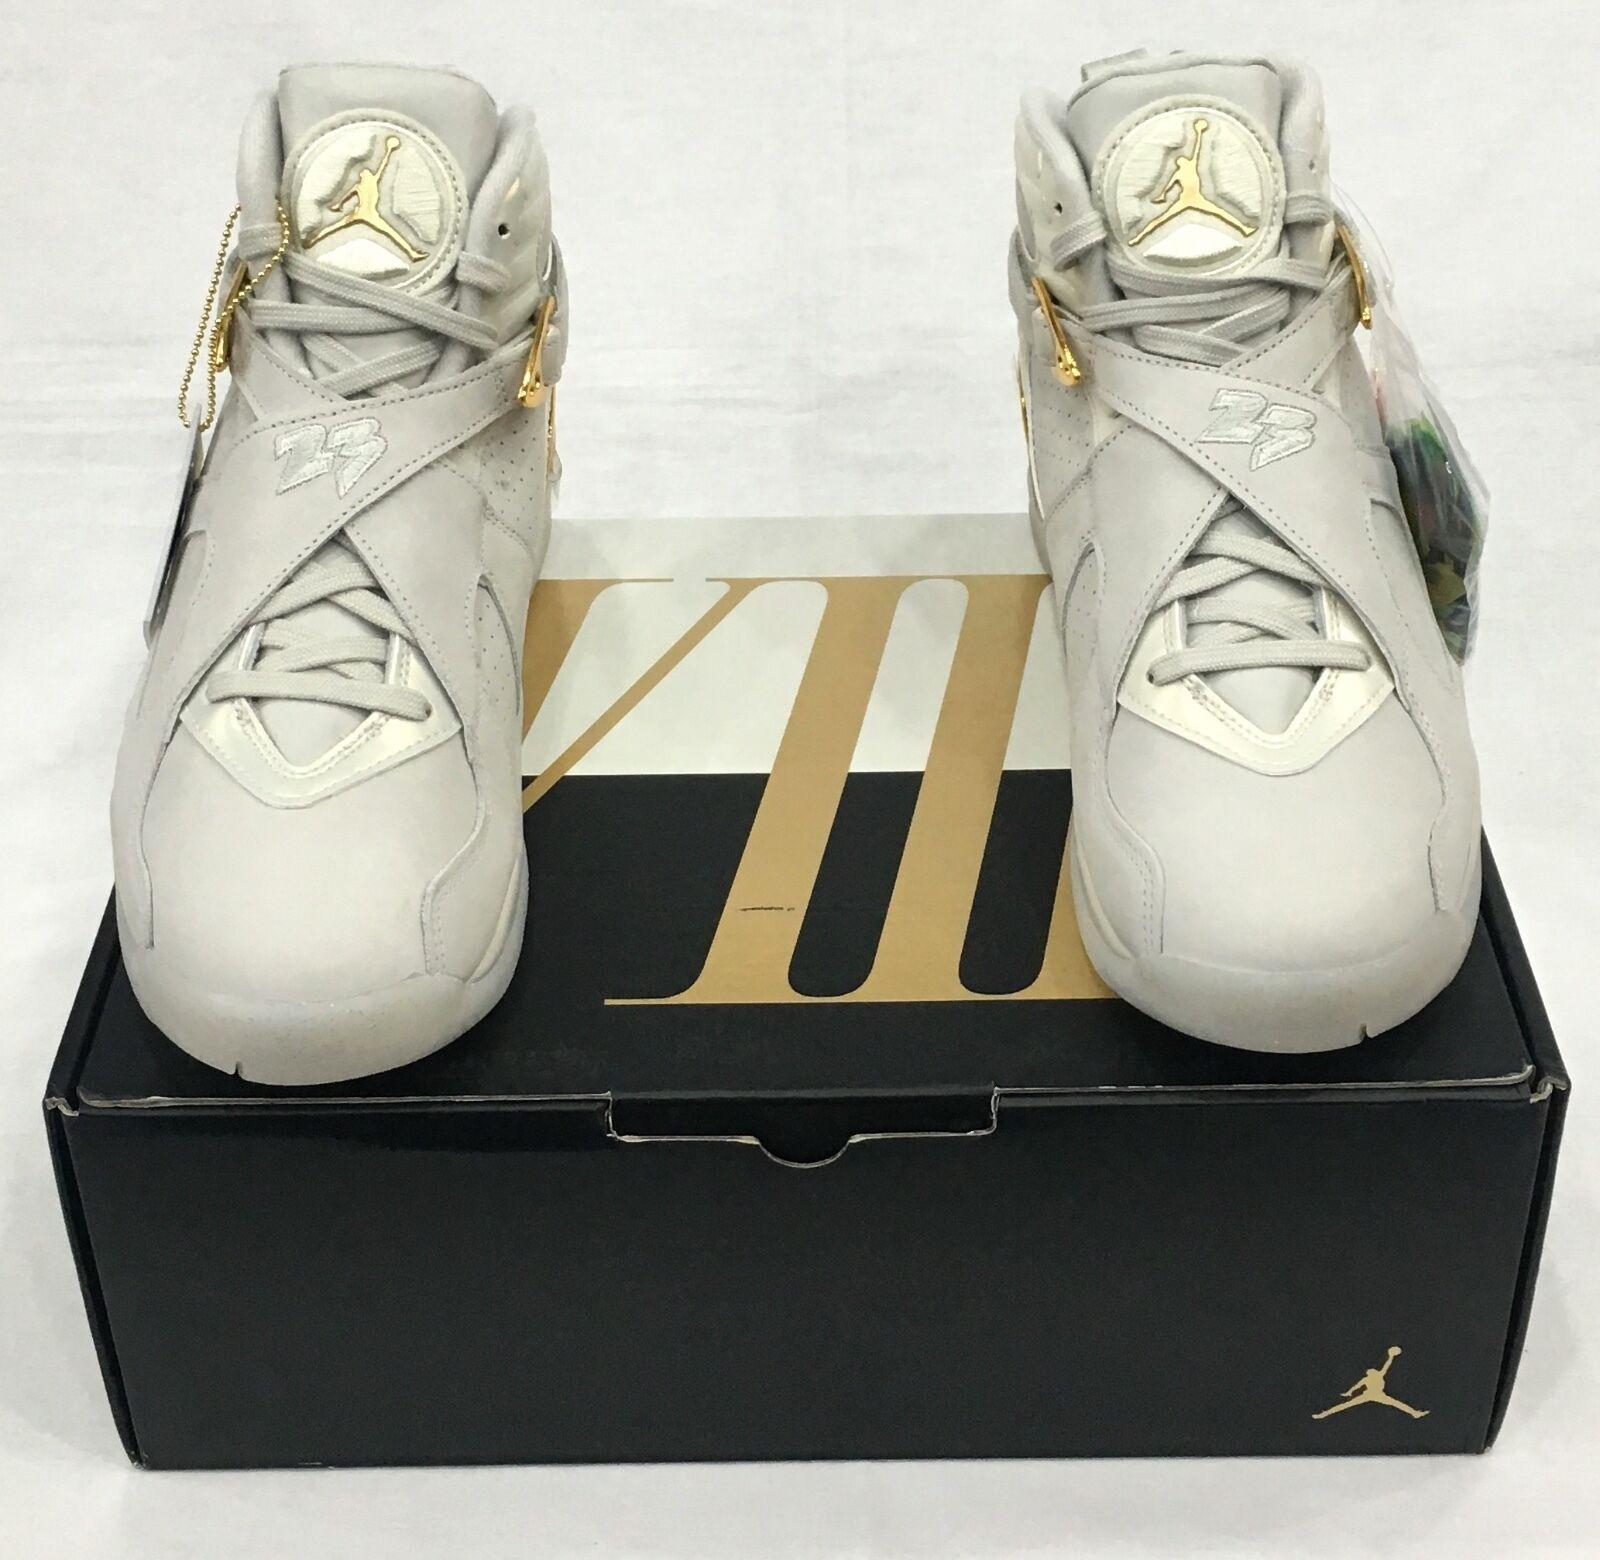 Nike Air Jordan 8 retro 832821-030 C & C champagne 832821-030 retro 4f426a